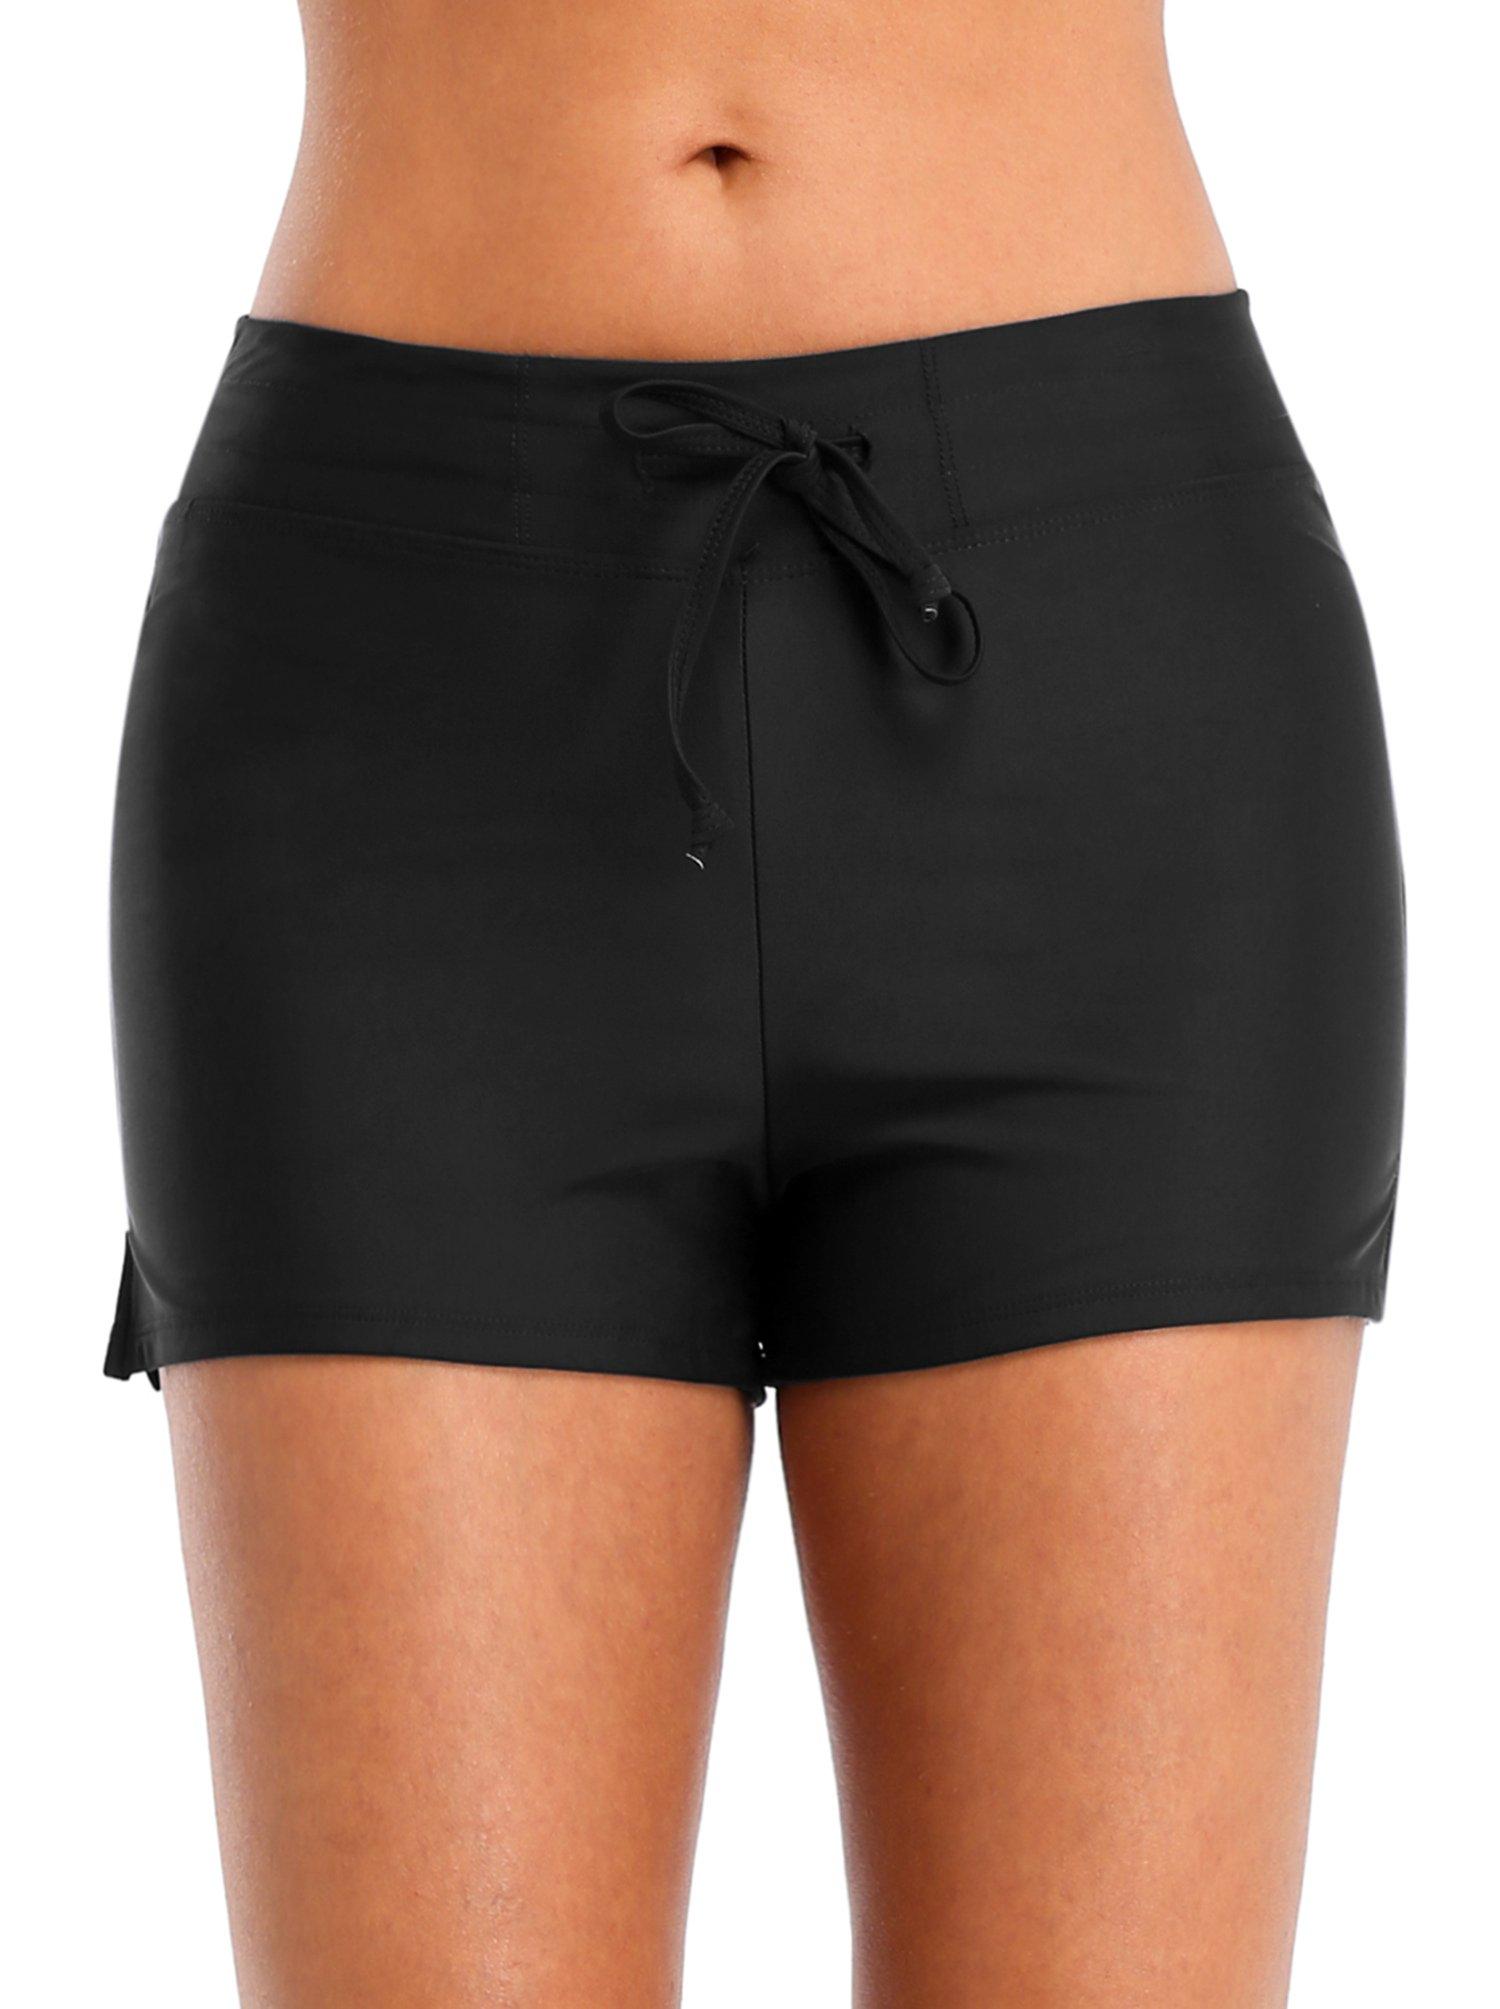 Vegatos Womens Solid Boardshorts Swimming Shorts Swim Bottoms Surfing Boyshorts Black